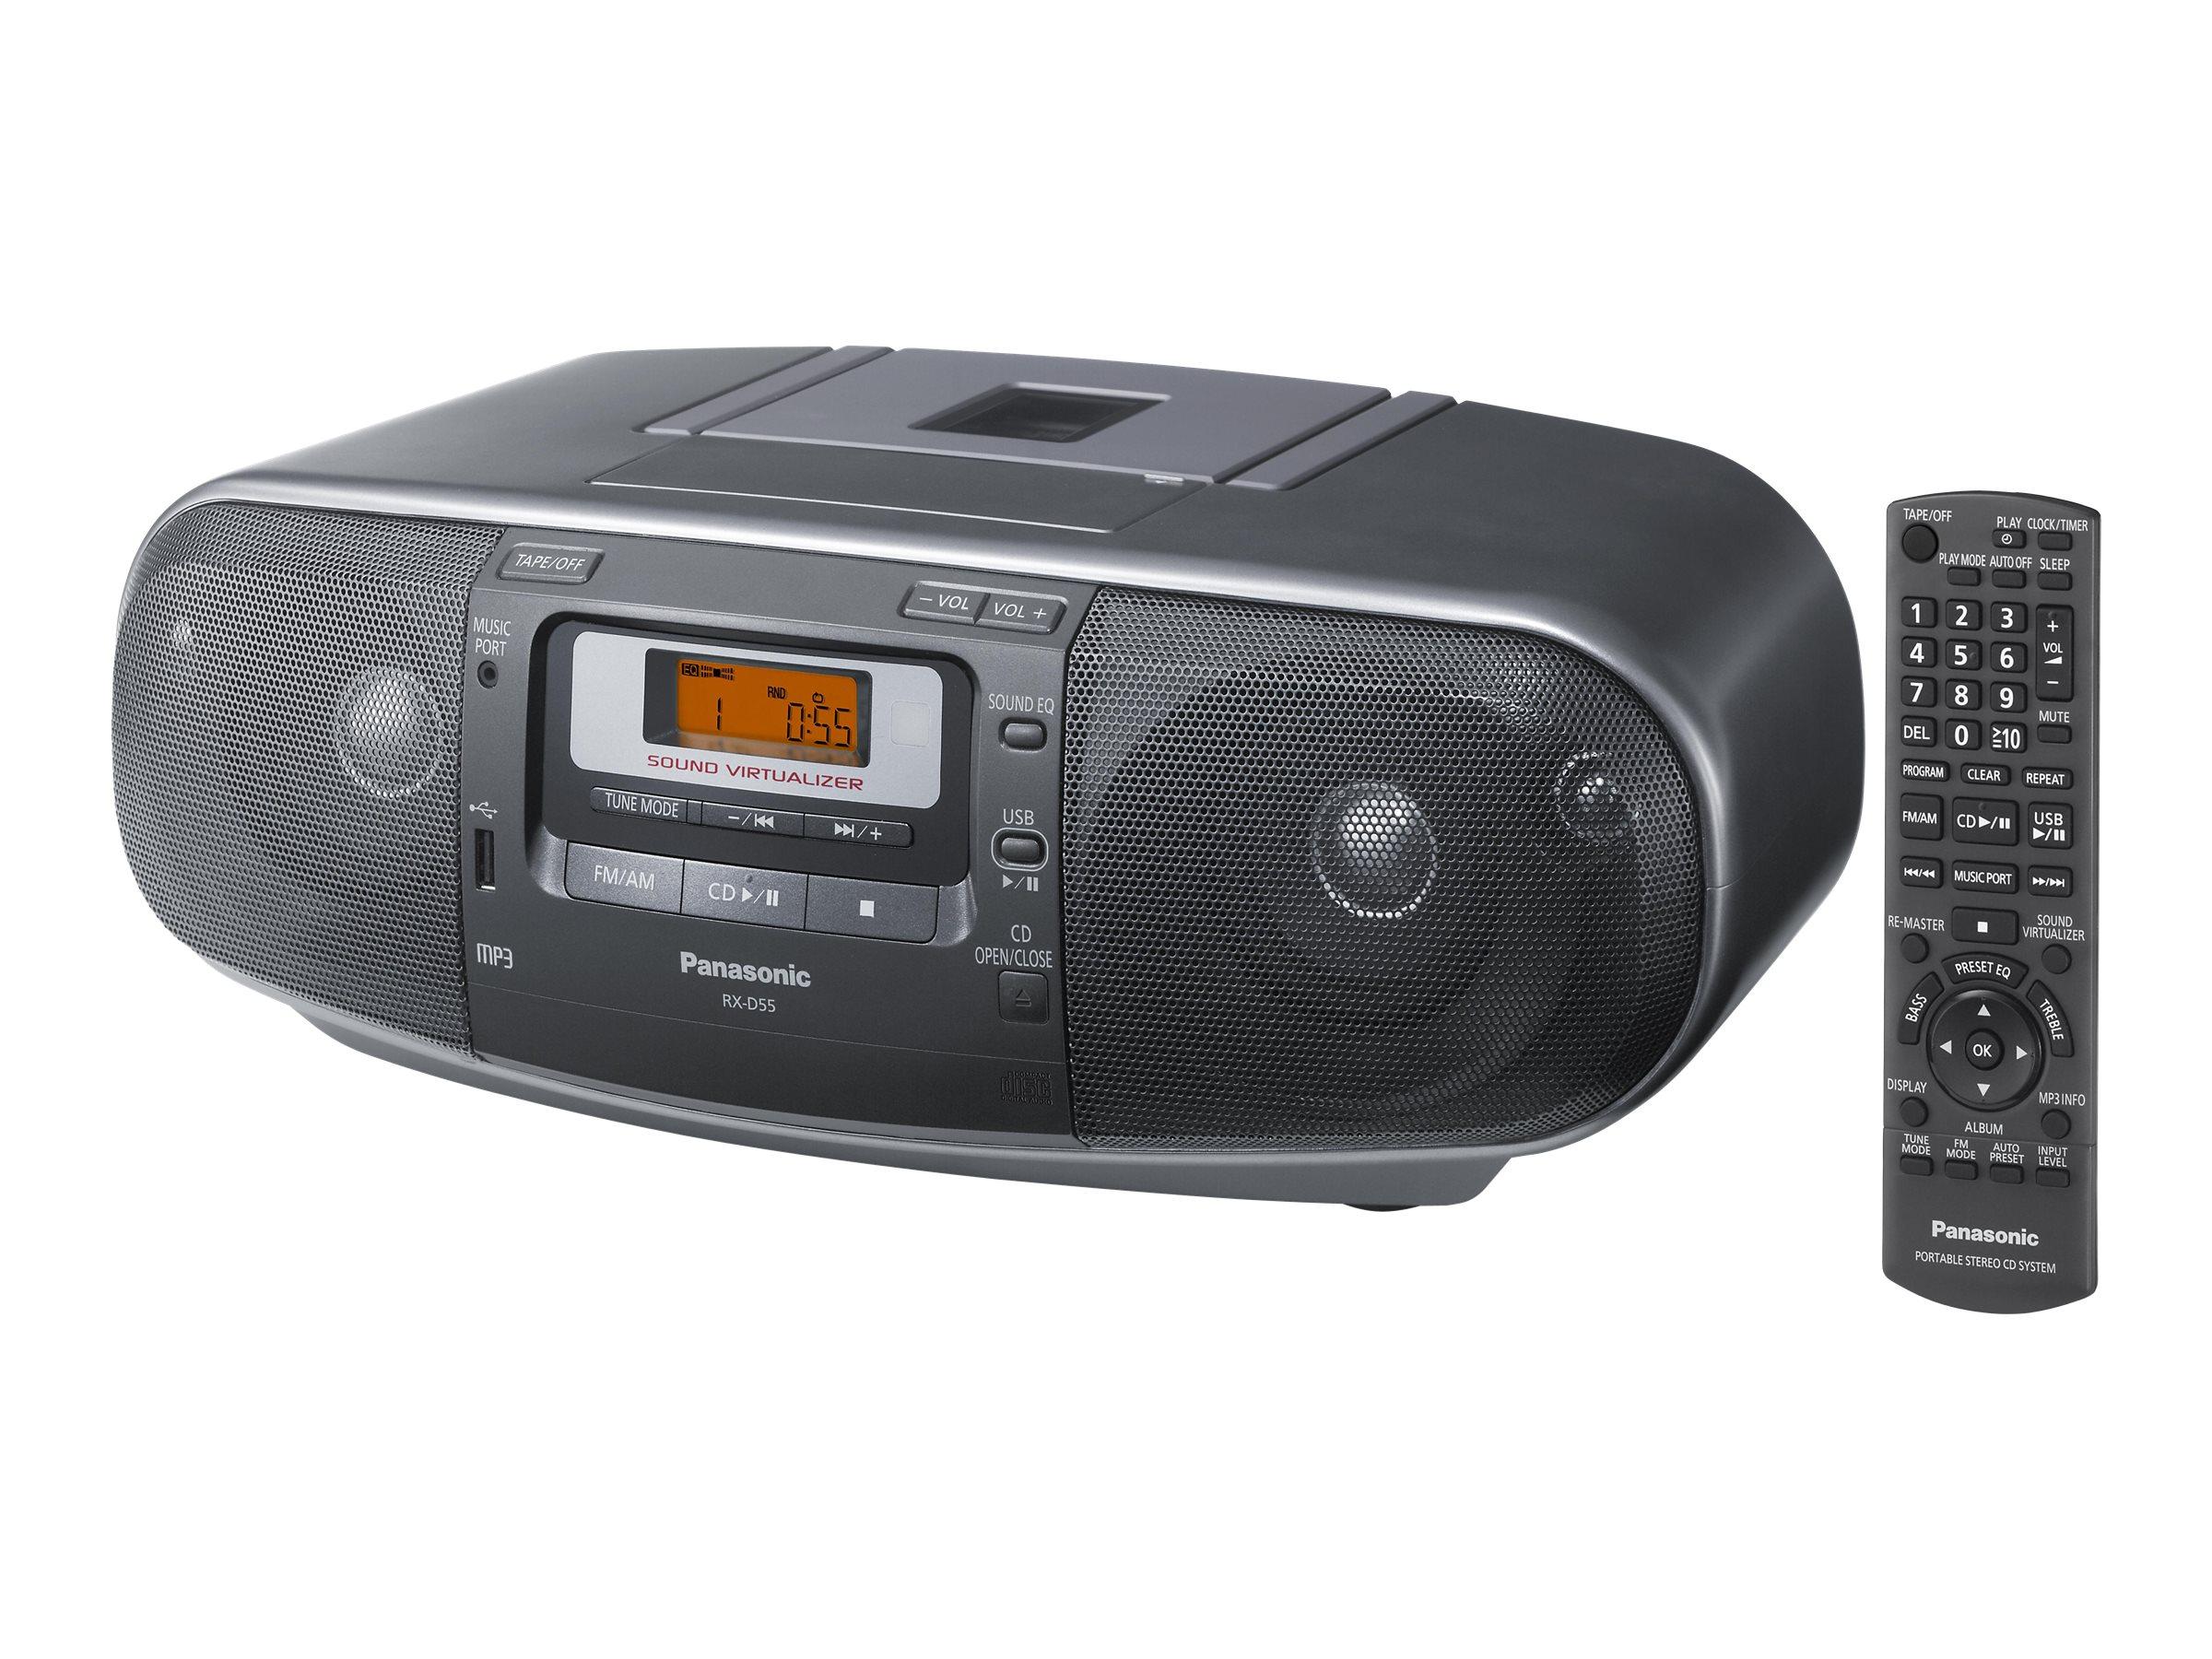 Panasonic RX-D55 - Ghettoblaster